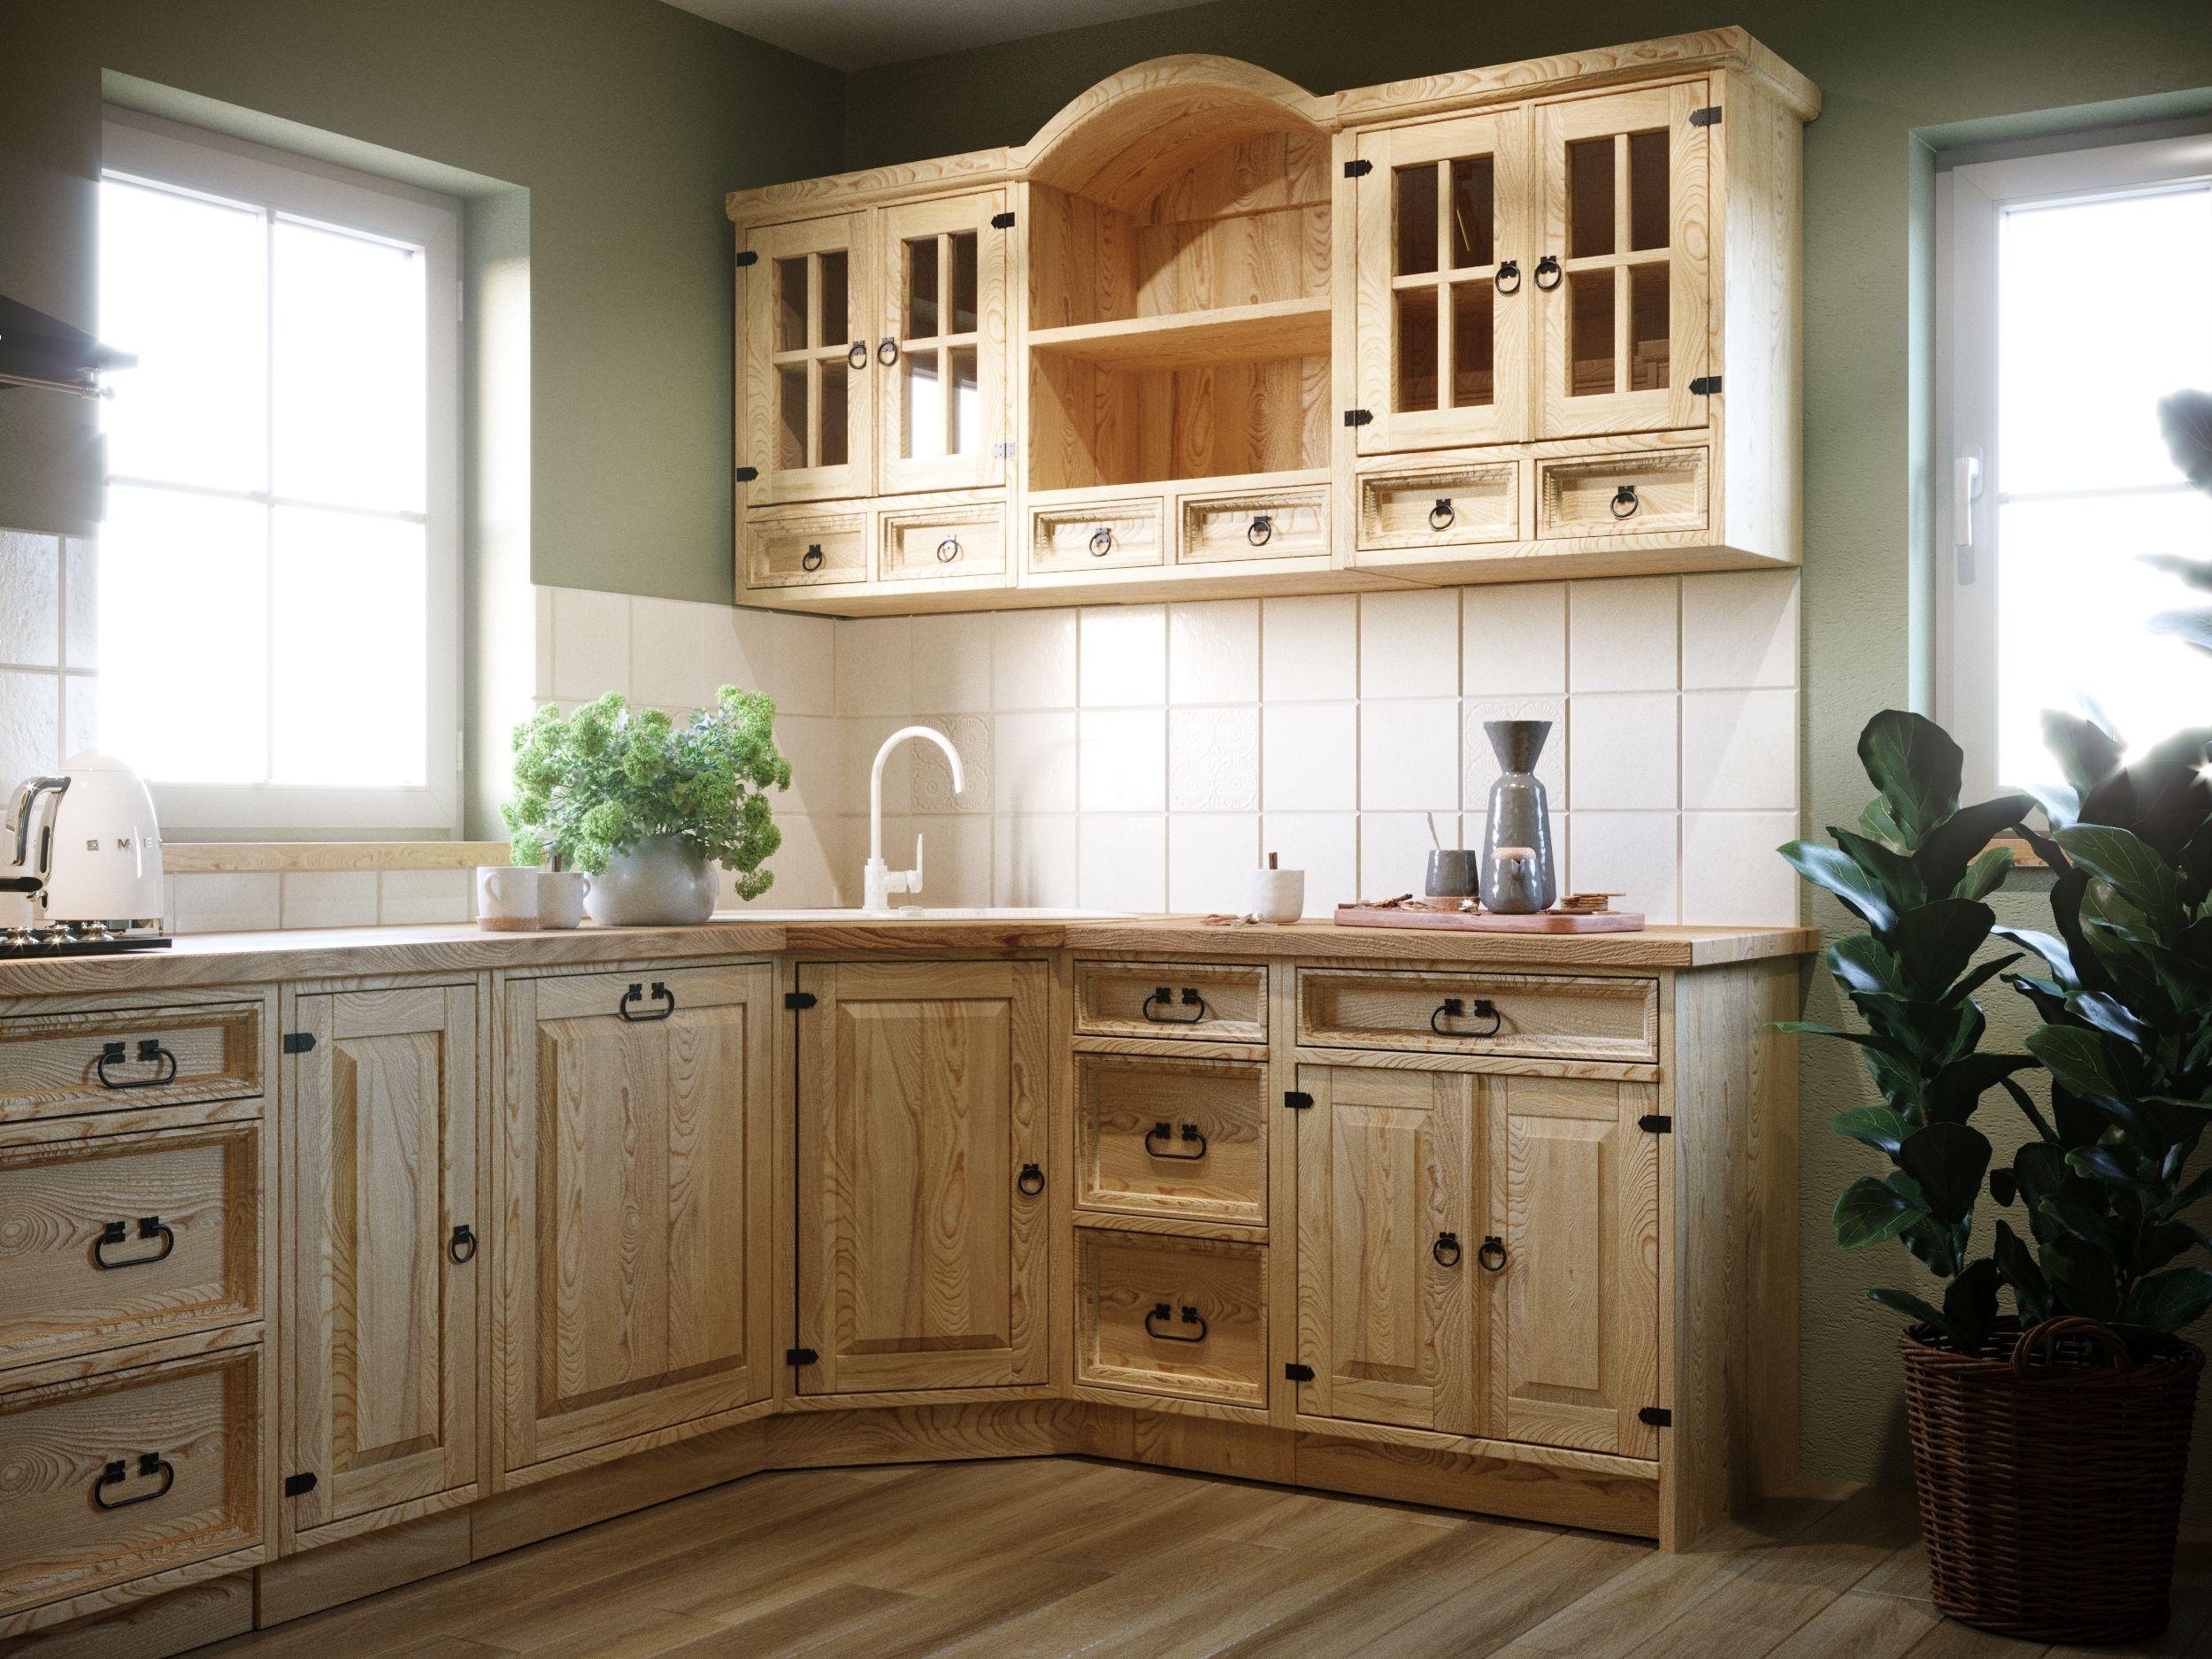 Meble Kuchenne Na Wymiar Kitchen Cabinets Kitchen House Design